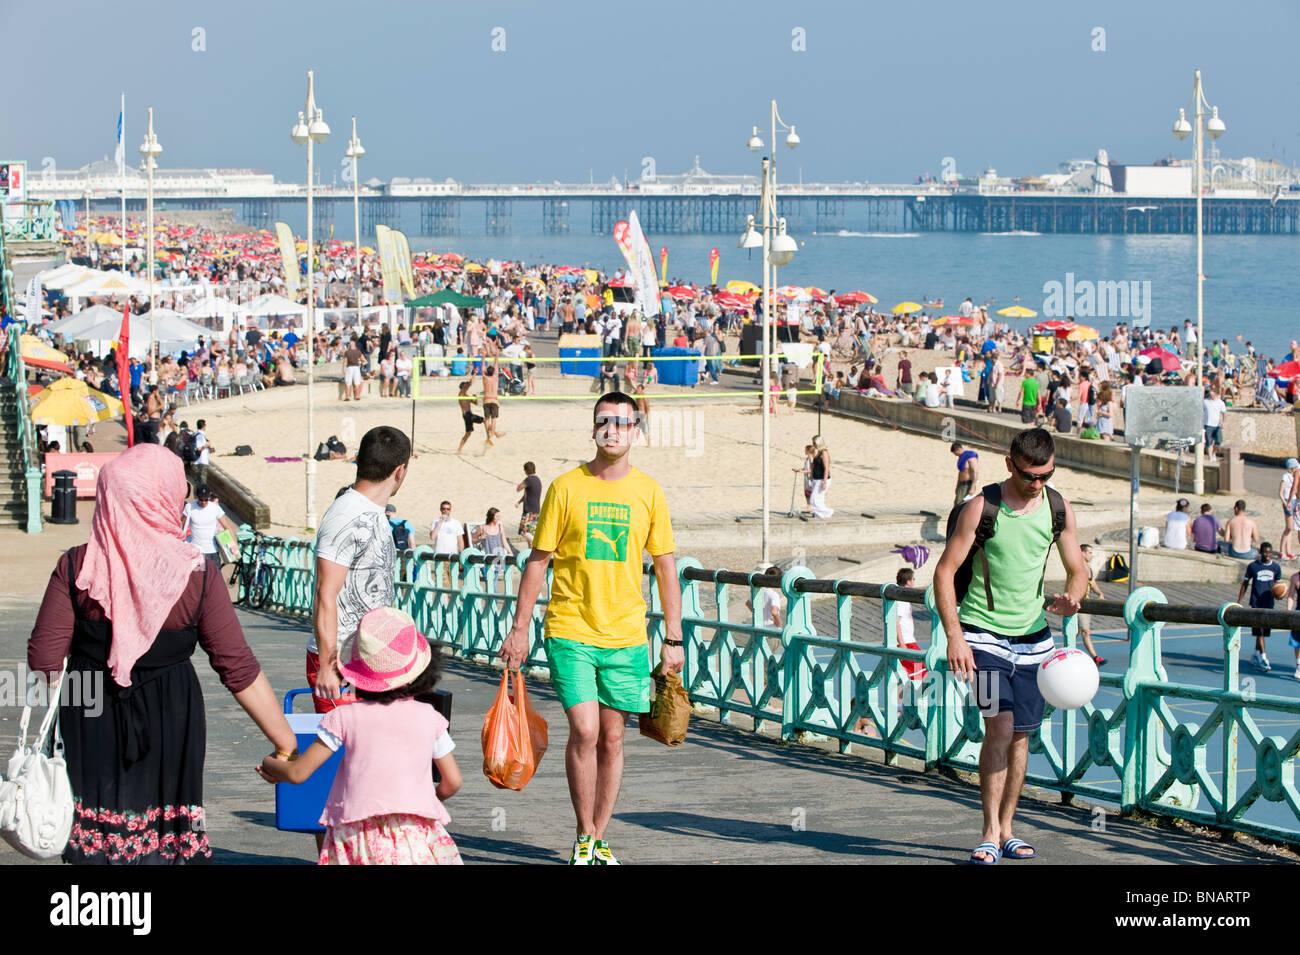 Seafront, Brighton, East Sussex, United Kingdom - Stock Image